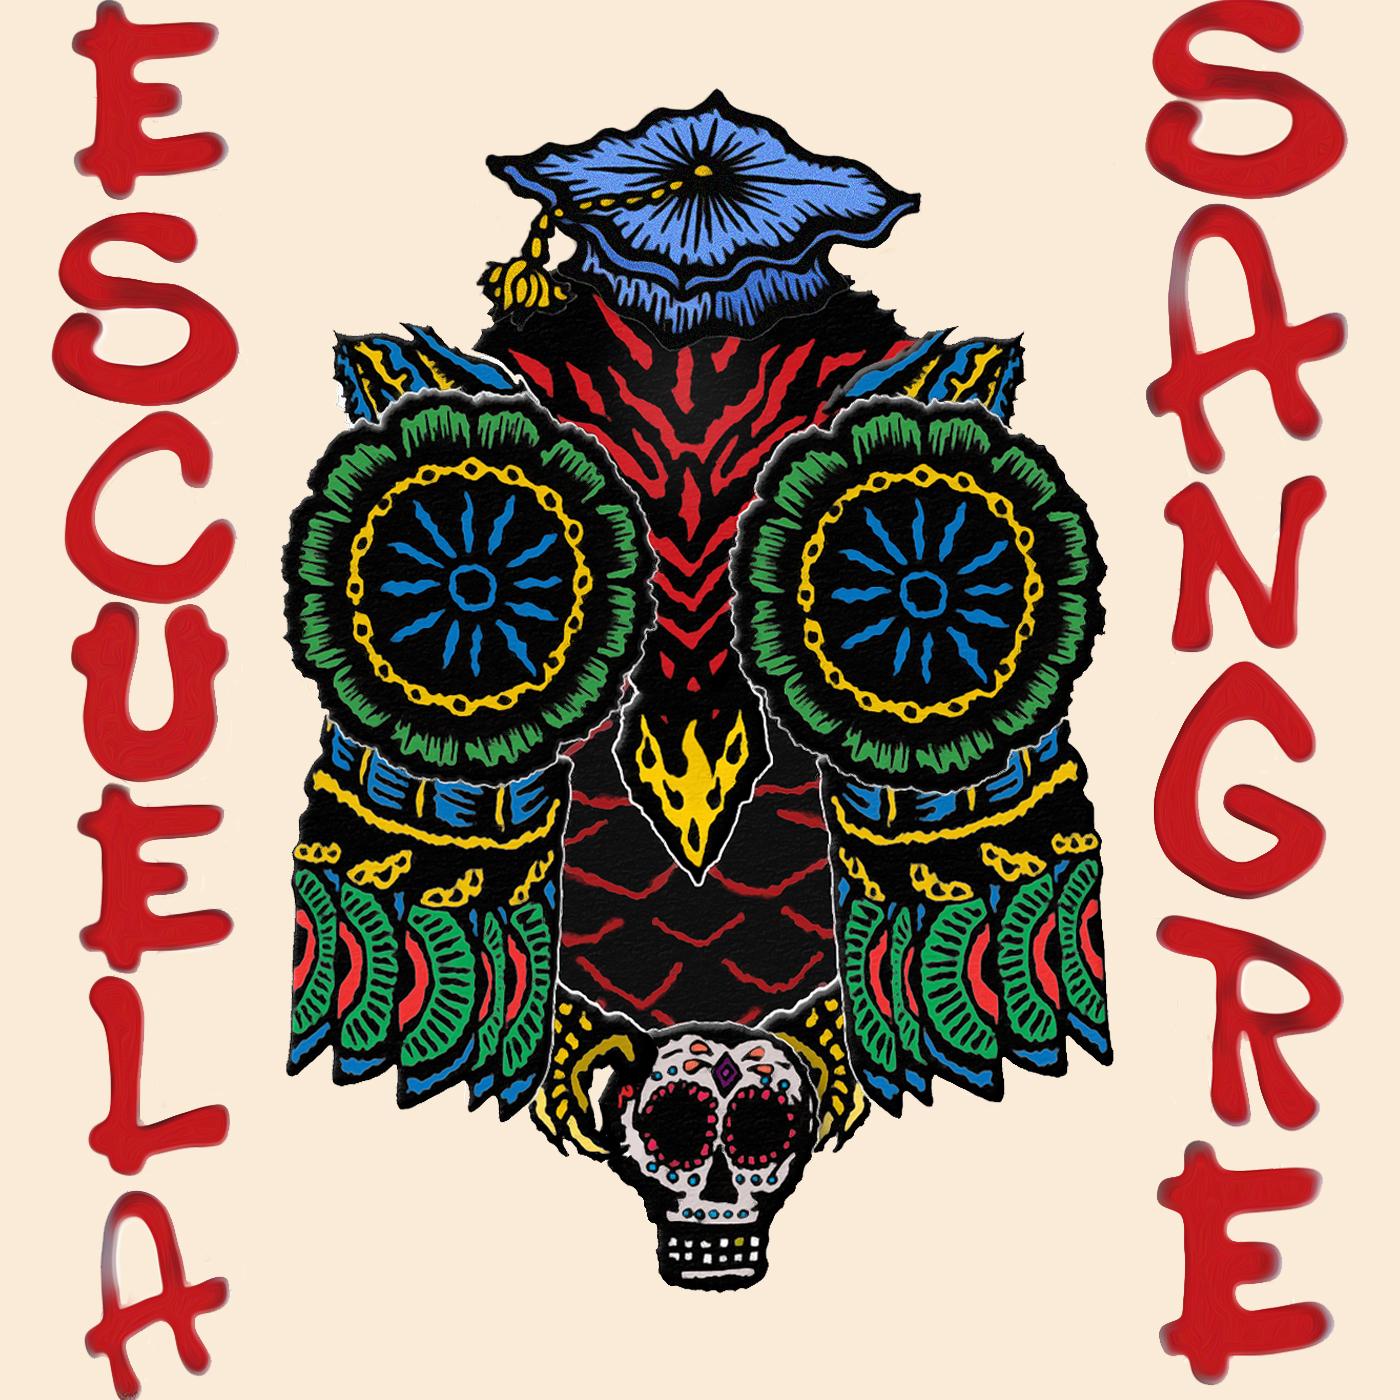 EscuelaSangreLogo (2).jpg